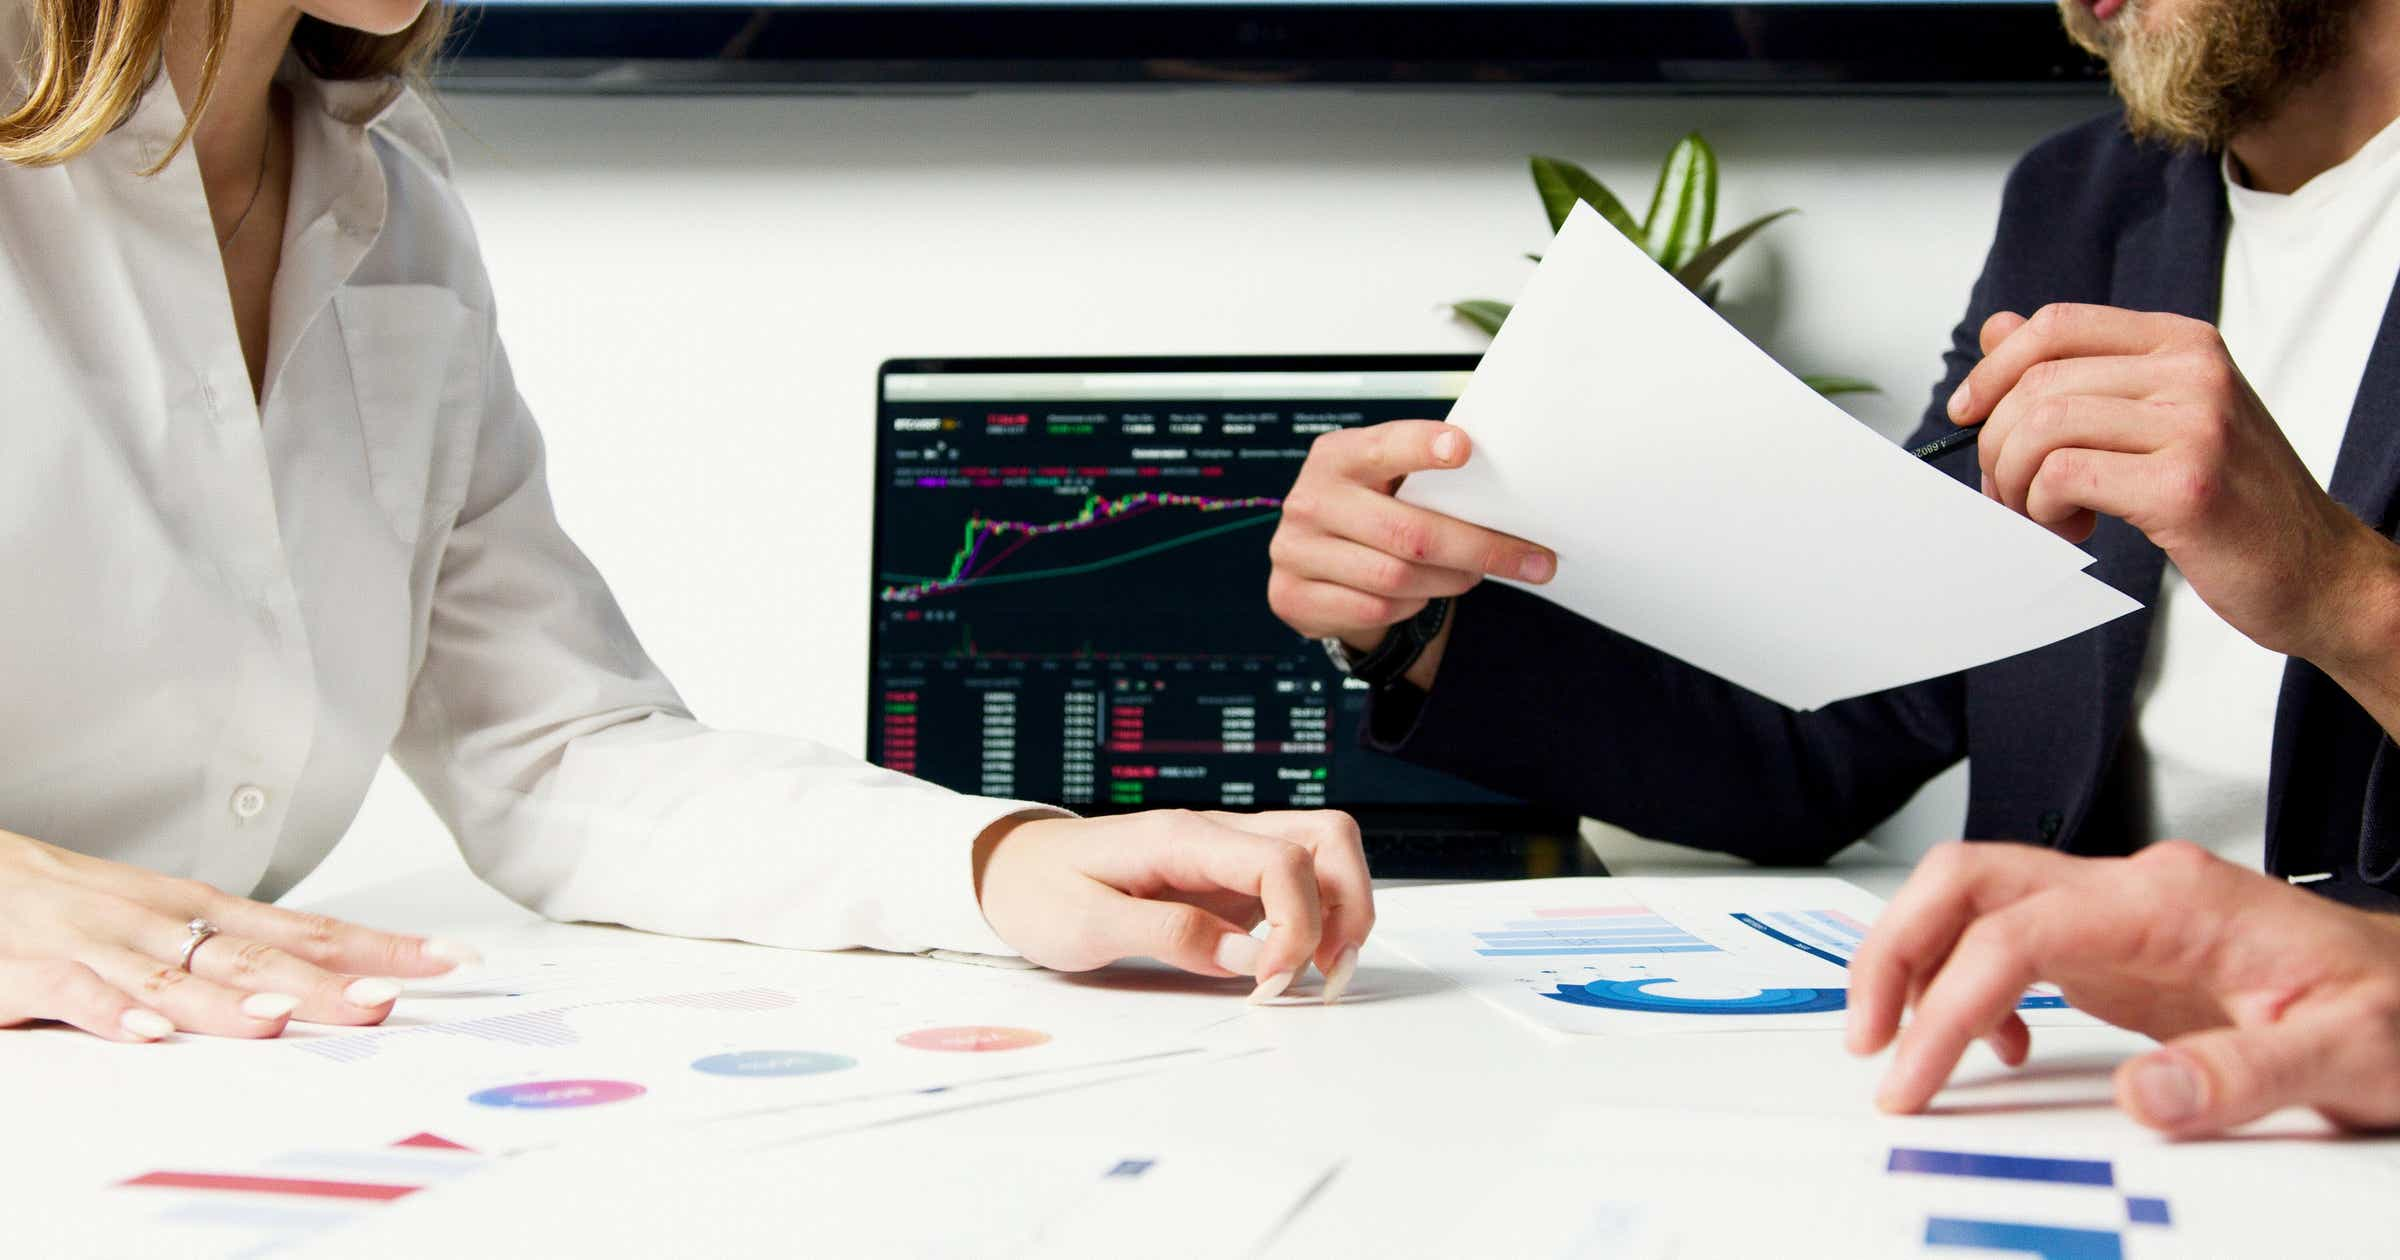 Digital Marketing – The Future of Marketing